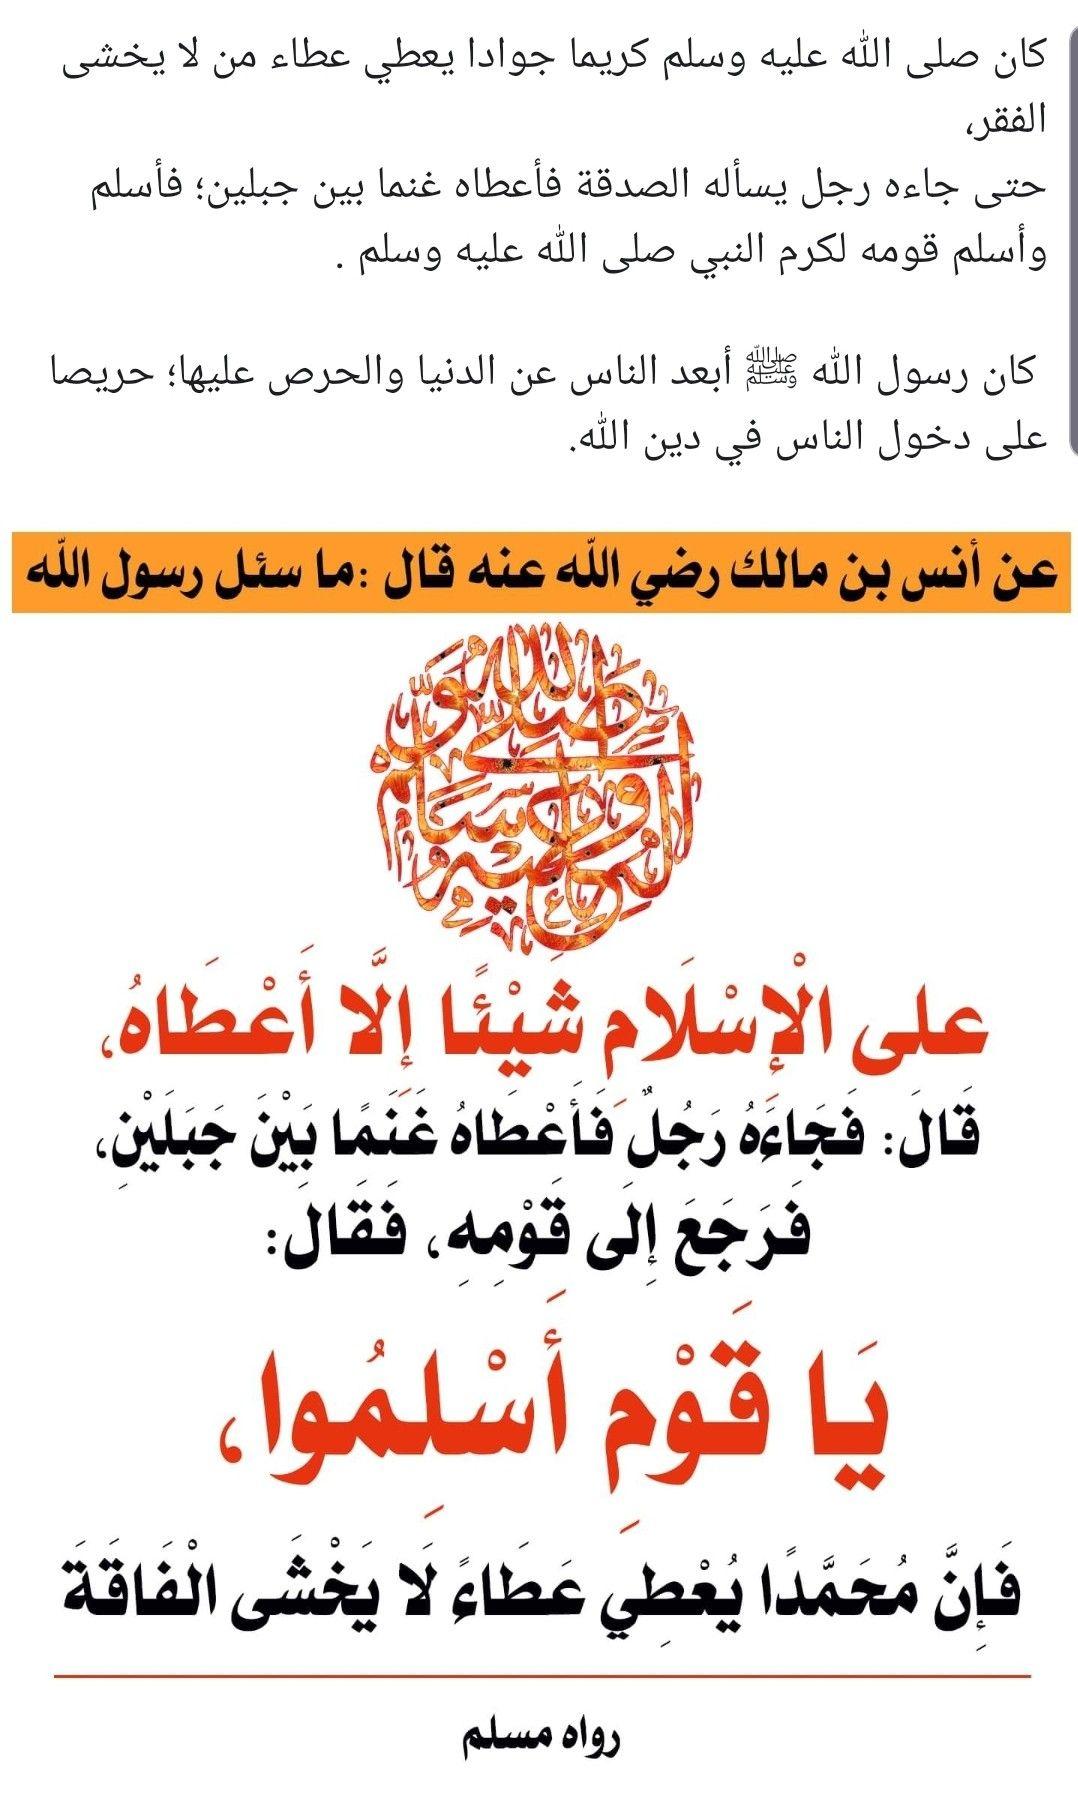 Pin By The Noble Quran On I Love Allah Quran Islam The Prophet Miracles Hadith Heaven Prophets Faith Prayer Dua حكم وعبر احاديث الله اسلام قرآن دعاء Hadith Islamic Calligraphy